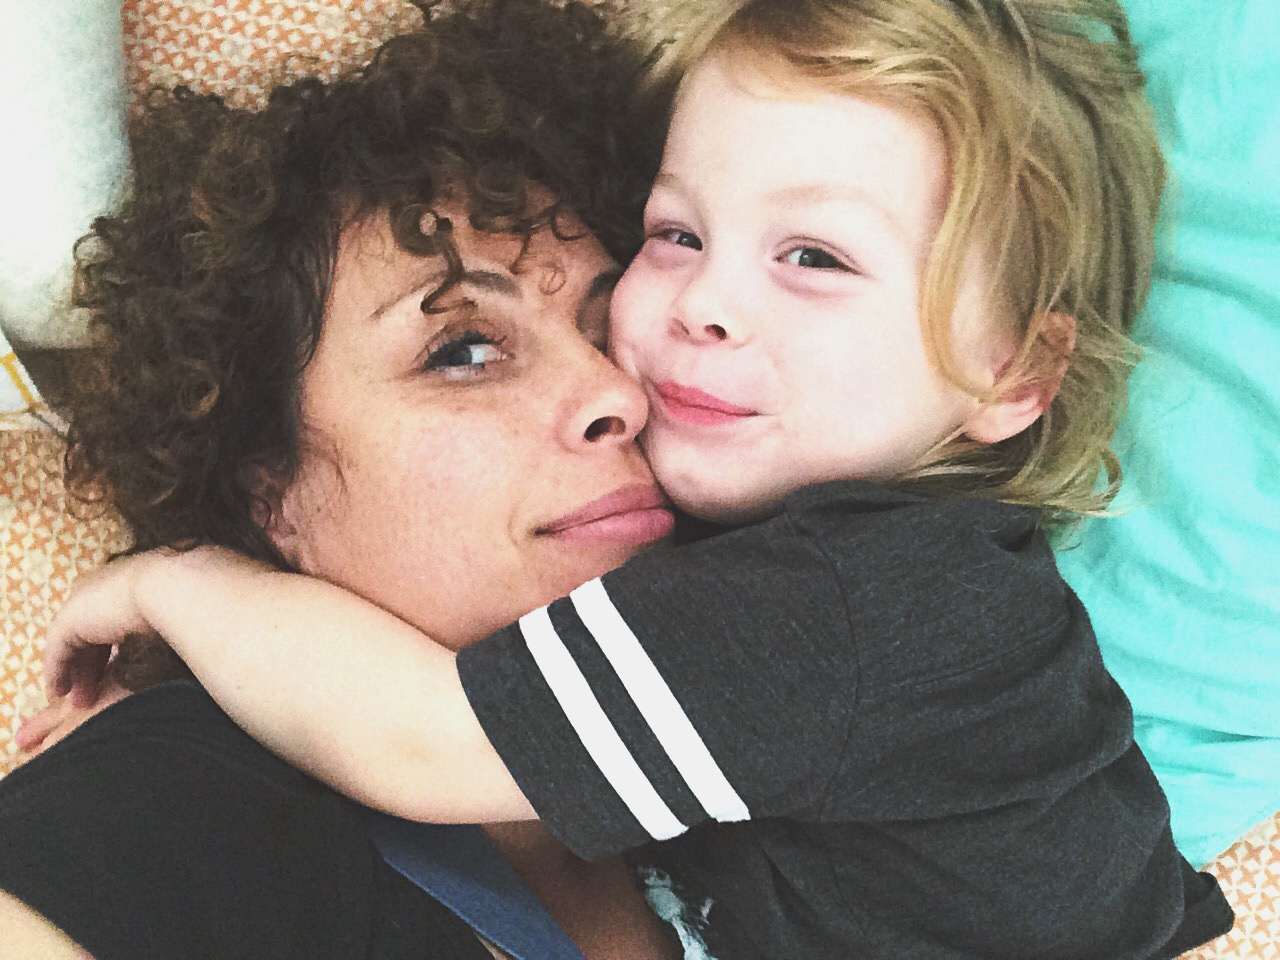 One of my Moments of Motherhood, selfie style